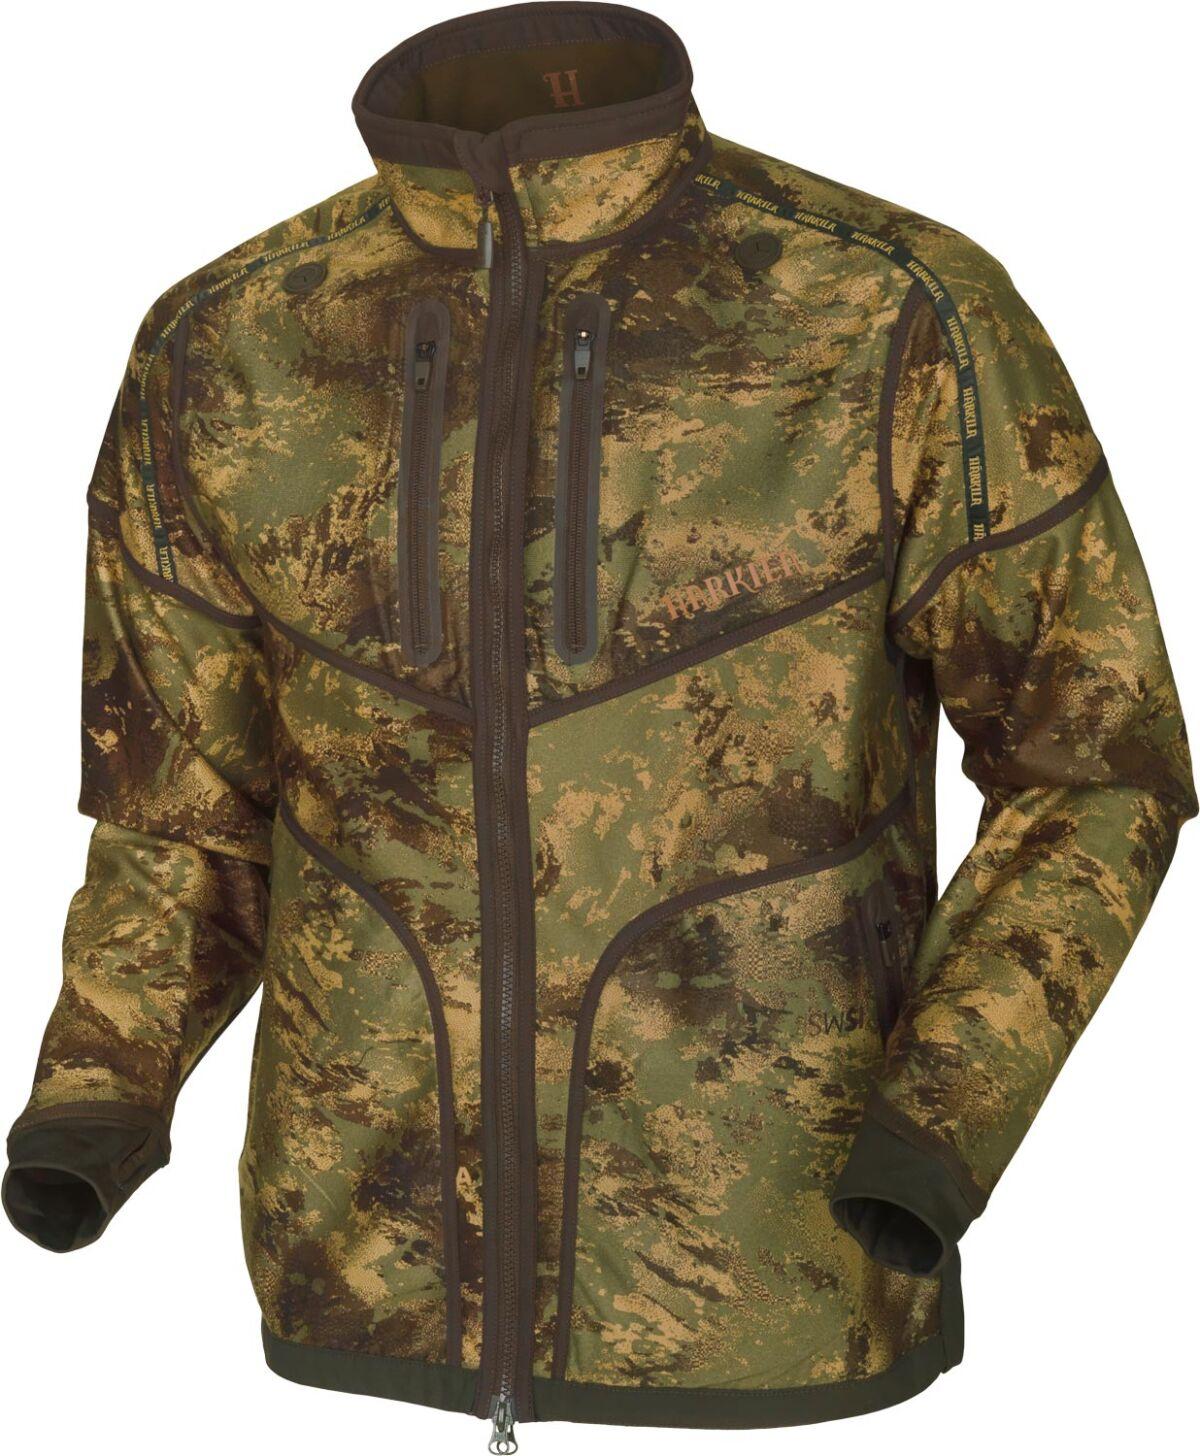 Куртка Harkila Lynx Reversible. Размер – S. Цвет – Axis MSP&Forest Green